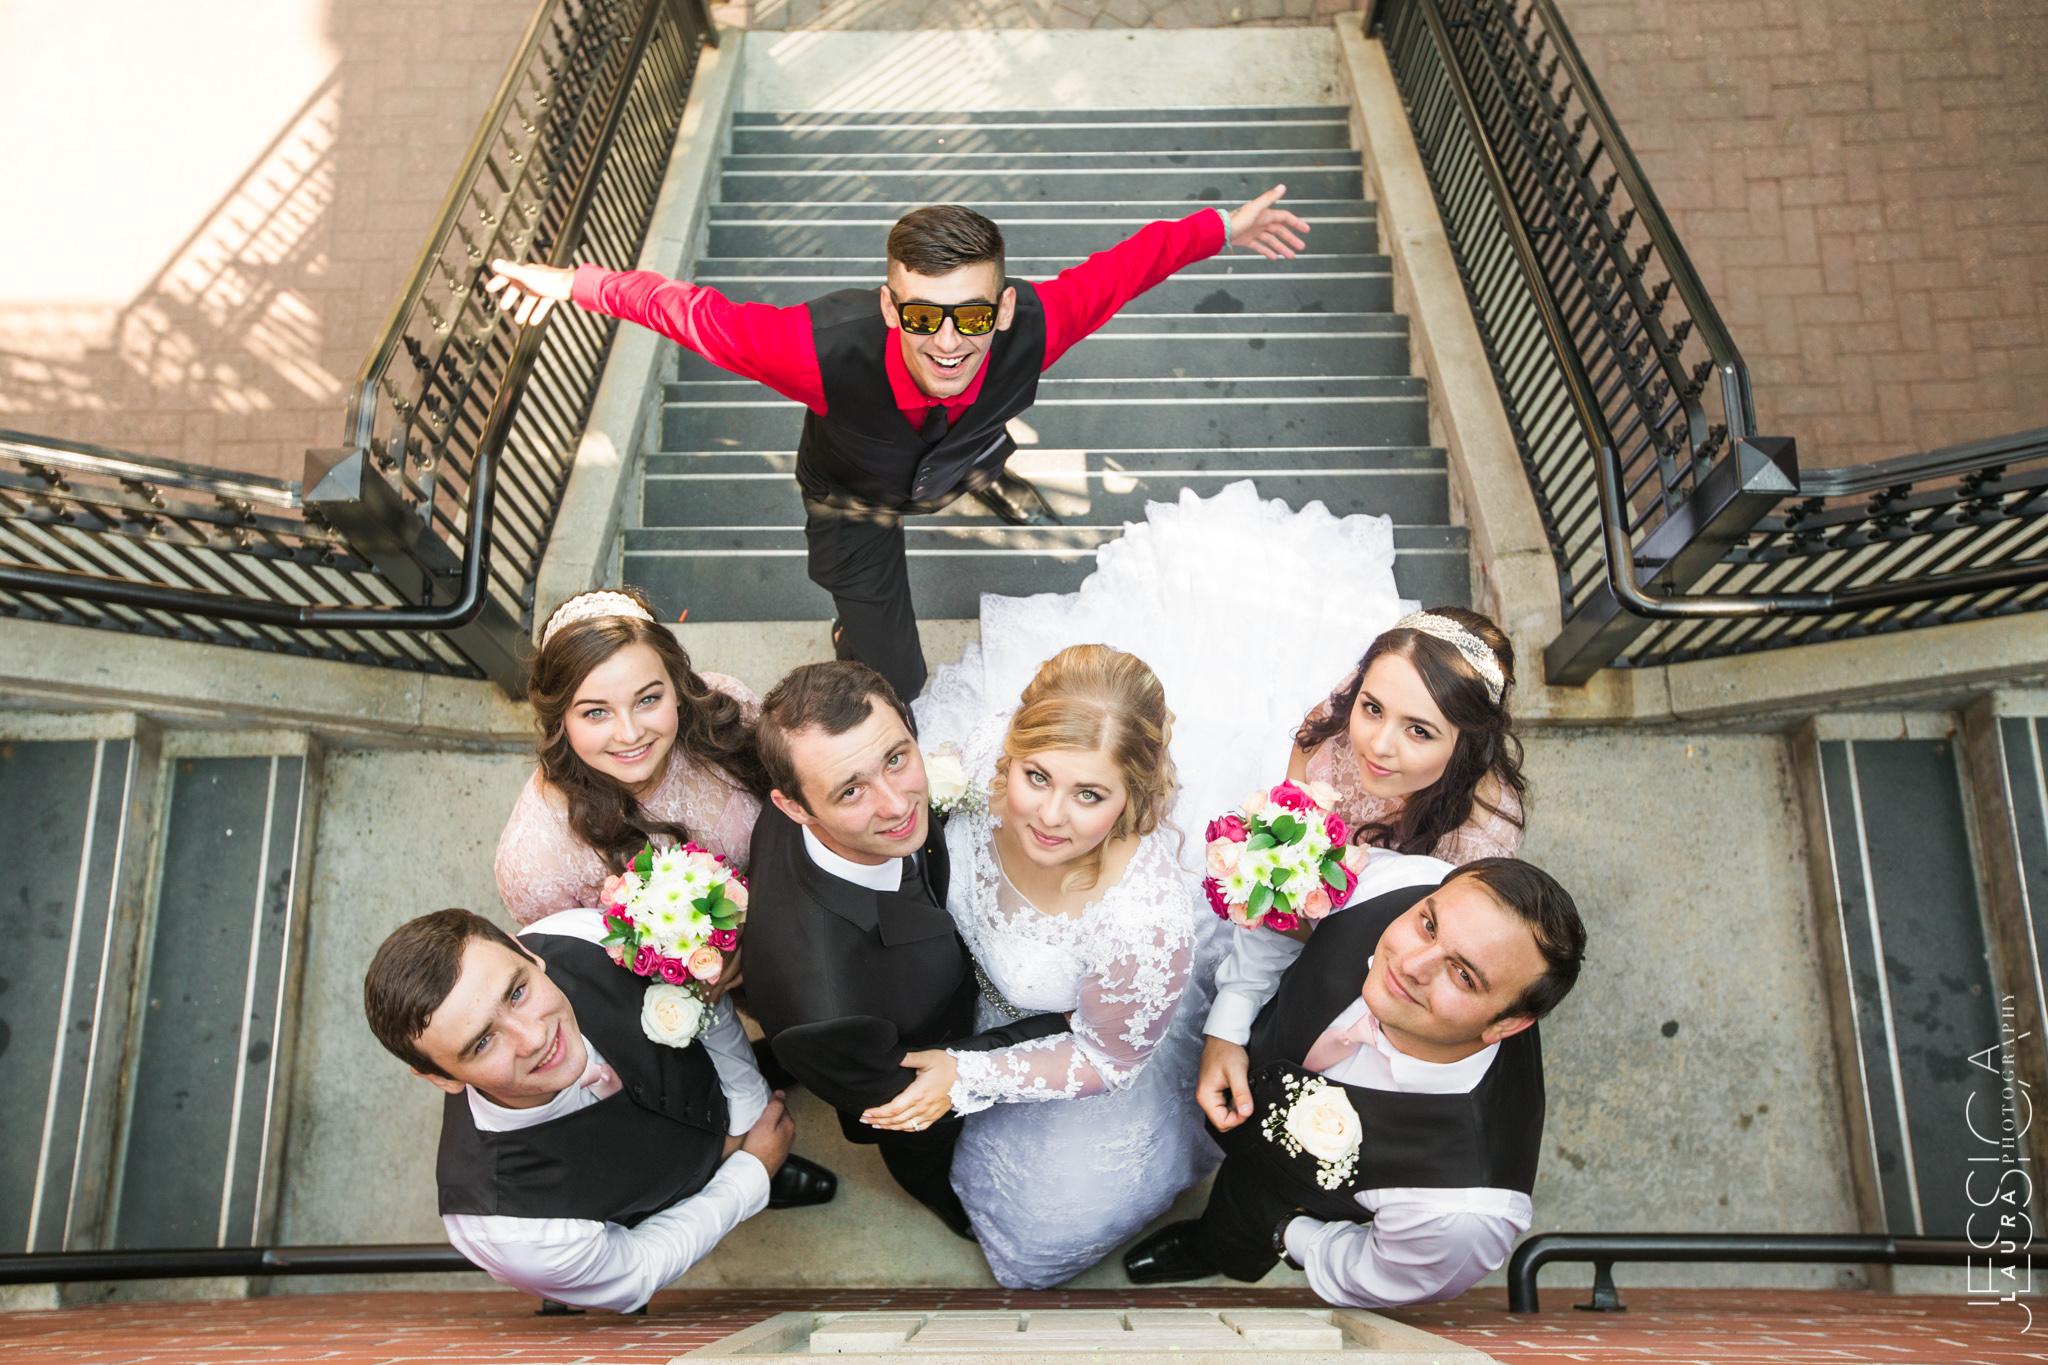 Eugene-Maryana_wedding_08062017_web (177 of 558).JPG